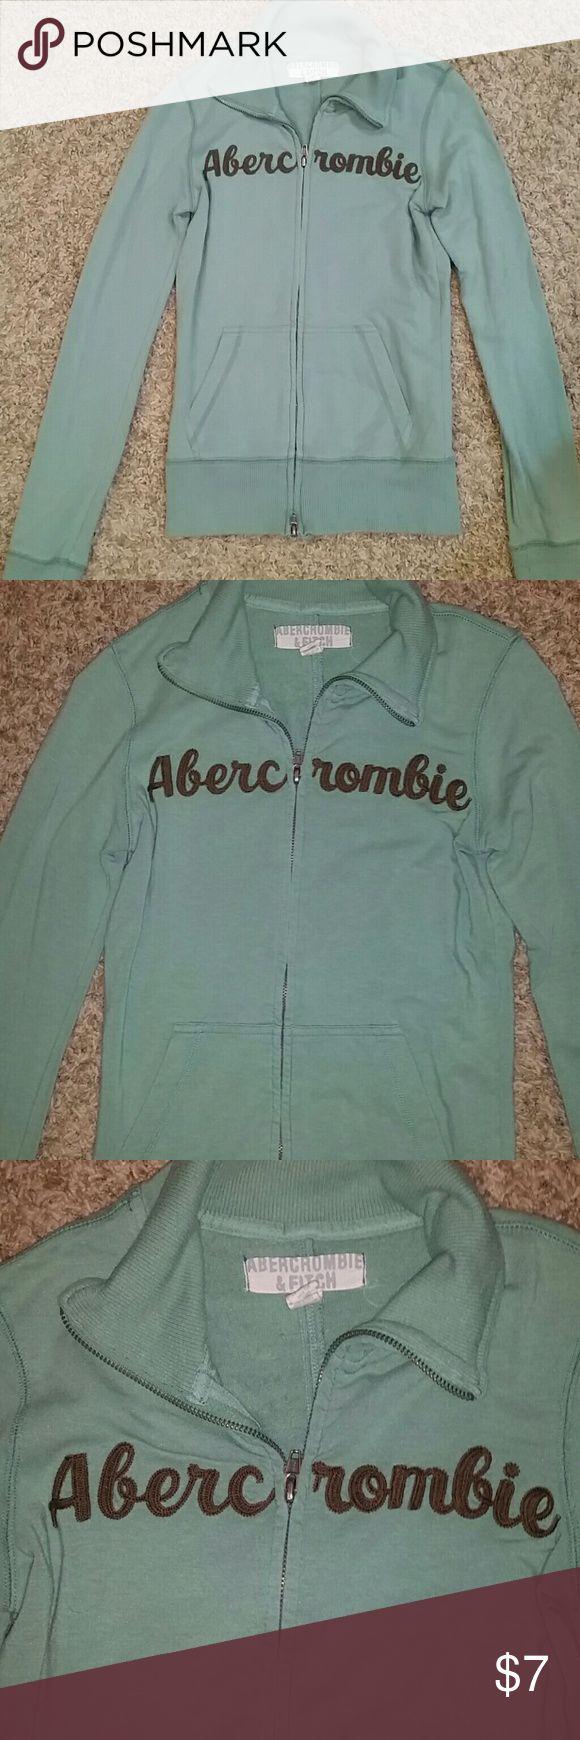 Abercrombie Green Zip Up Long Sleeve  Jacket Excellent Condition... Abercrombie & Fitch Green Zip Up Jacket Abercrombie & Fitch Jackets & Coats